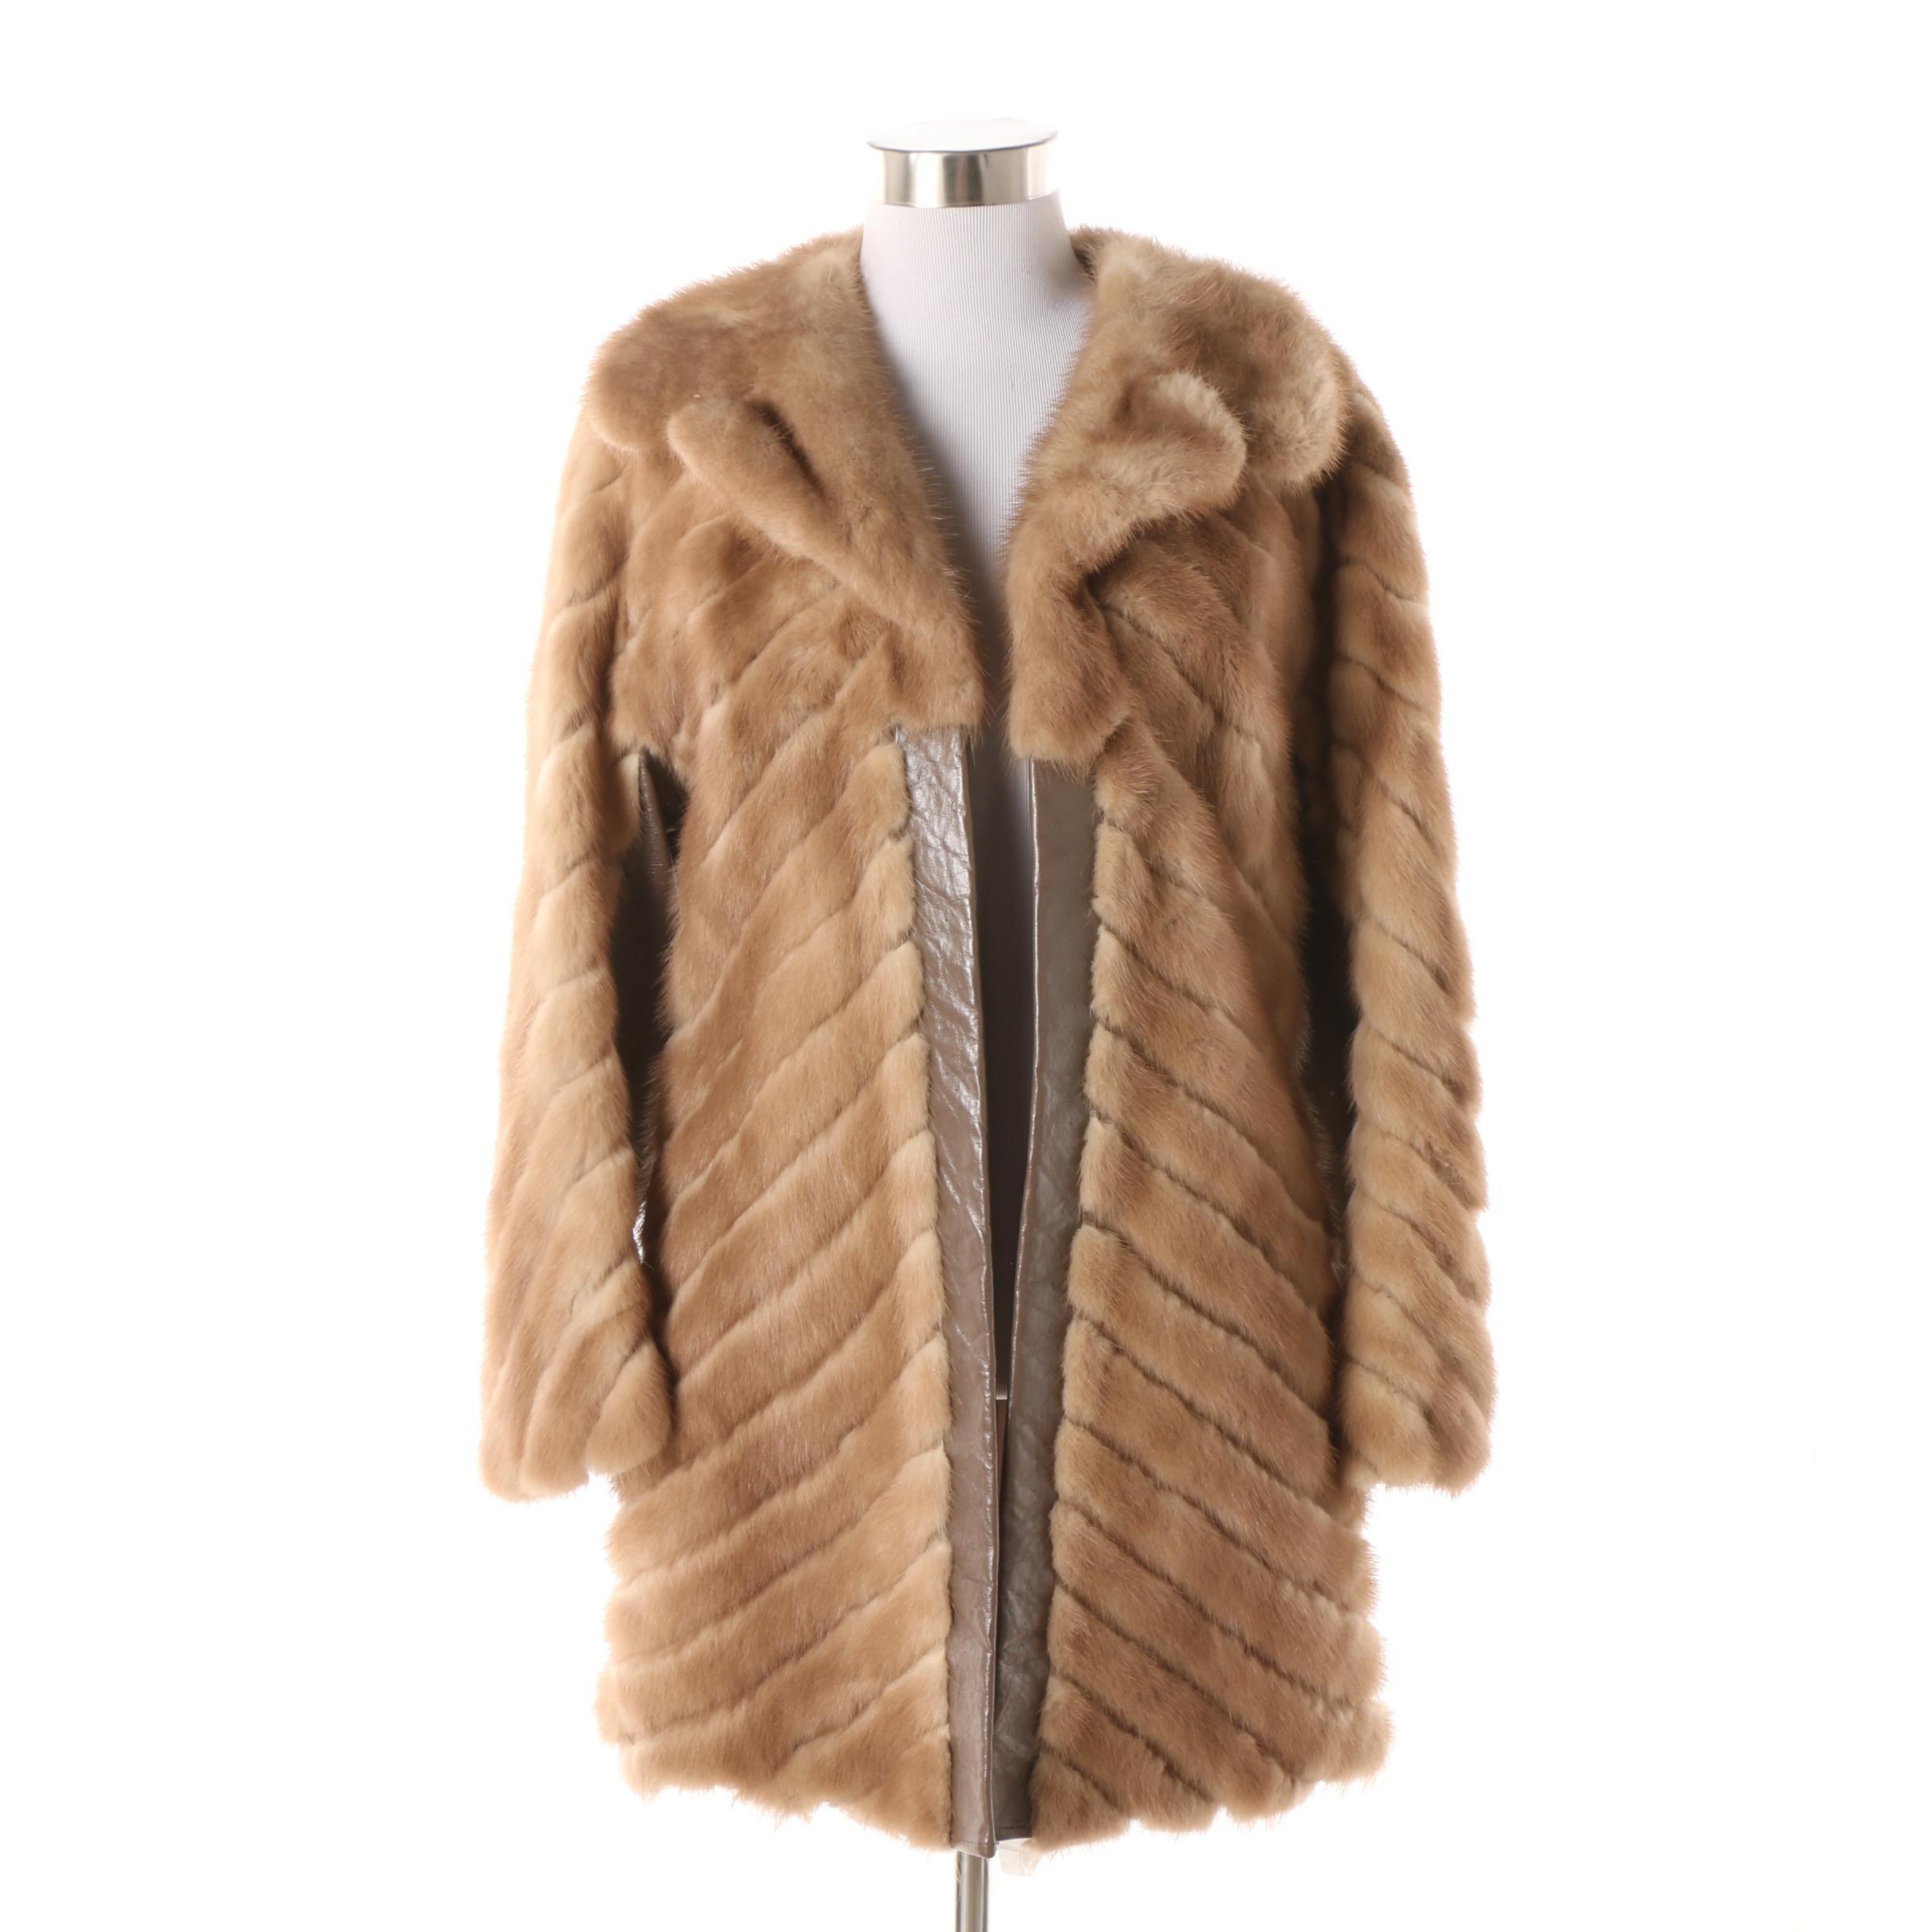 Women's 1970s Vintage Mink Fur Coat with Leather Trim